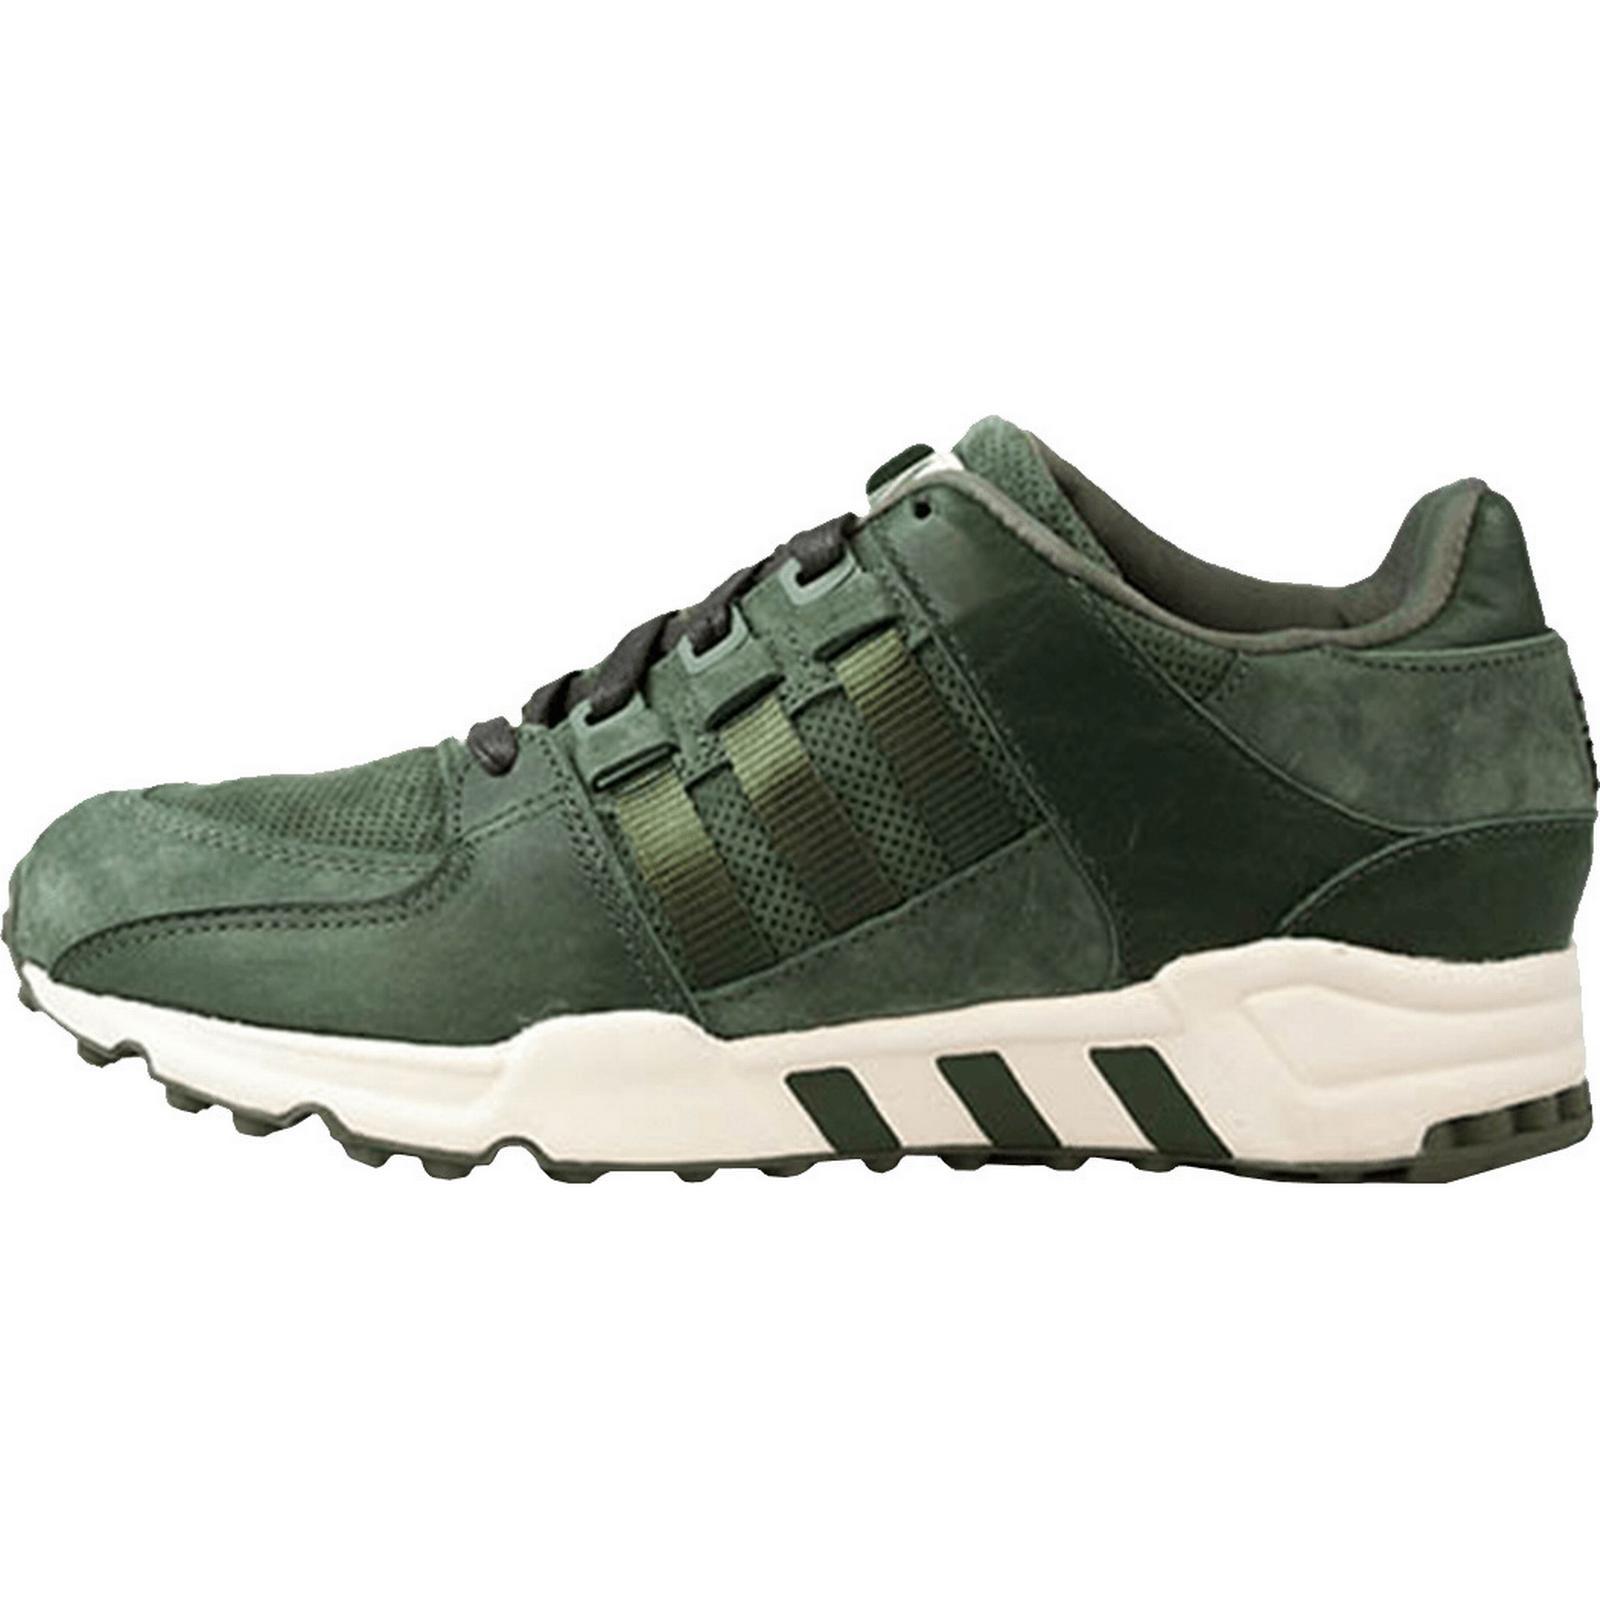 Adidas Running Equipment Running Adidas Support 93 - Groen 59b580